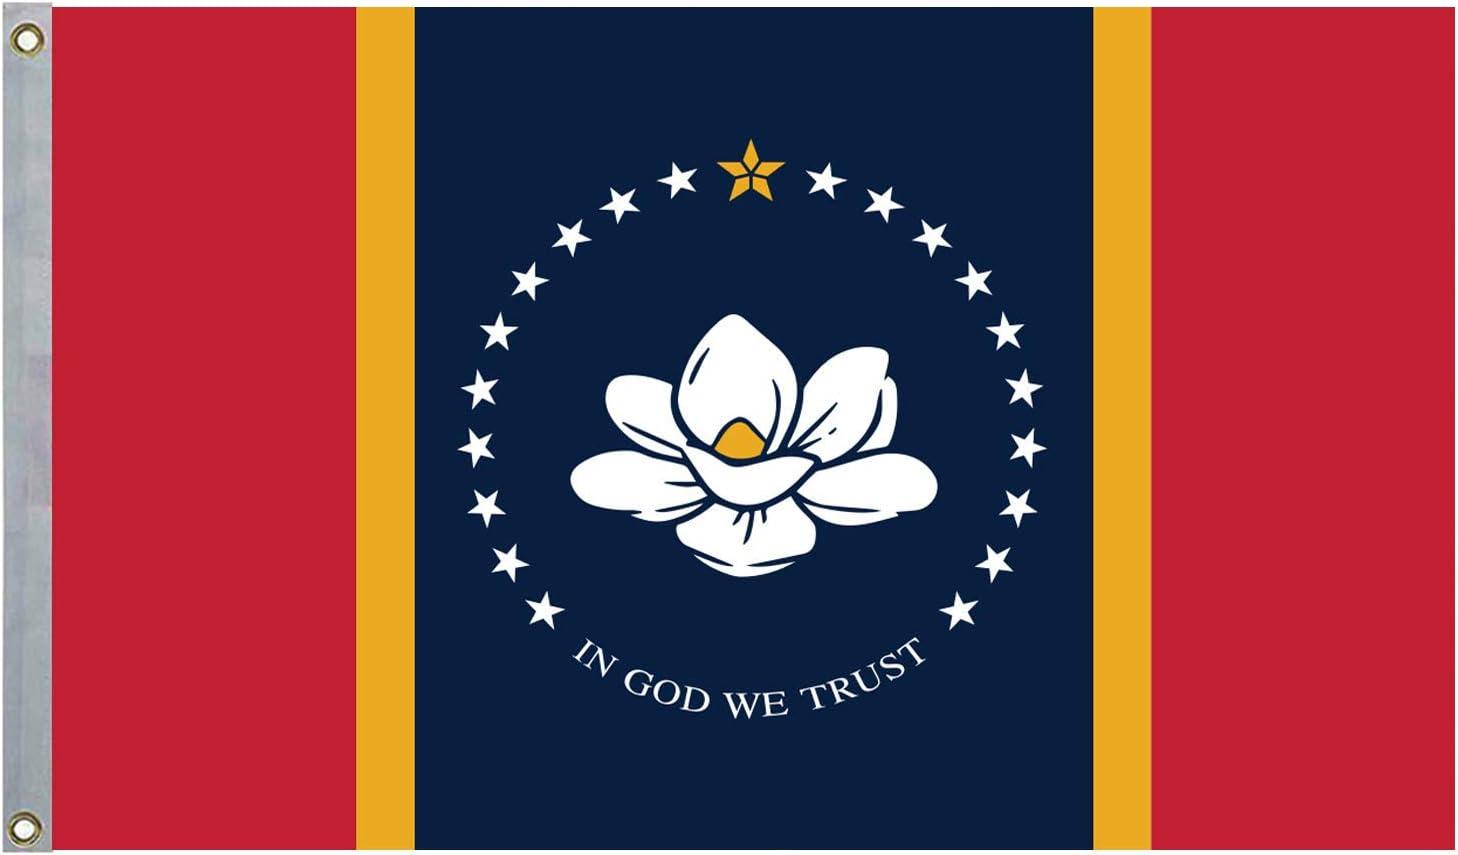 LOYOKI Newest Mississippi State Flag, in God We Trust Flag Magnolia Design Voter Indoor Outdoor Decoration Lawn Flag 3x5 Feet